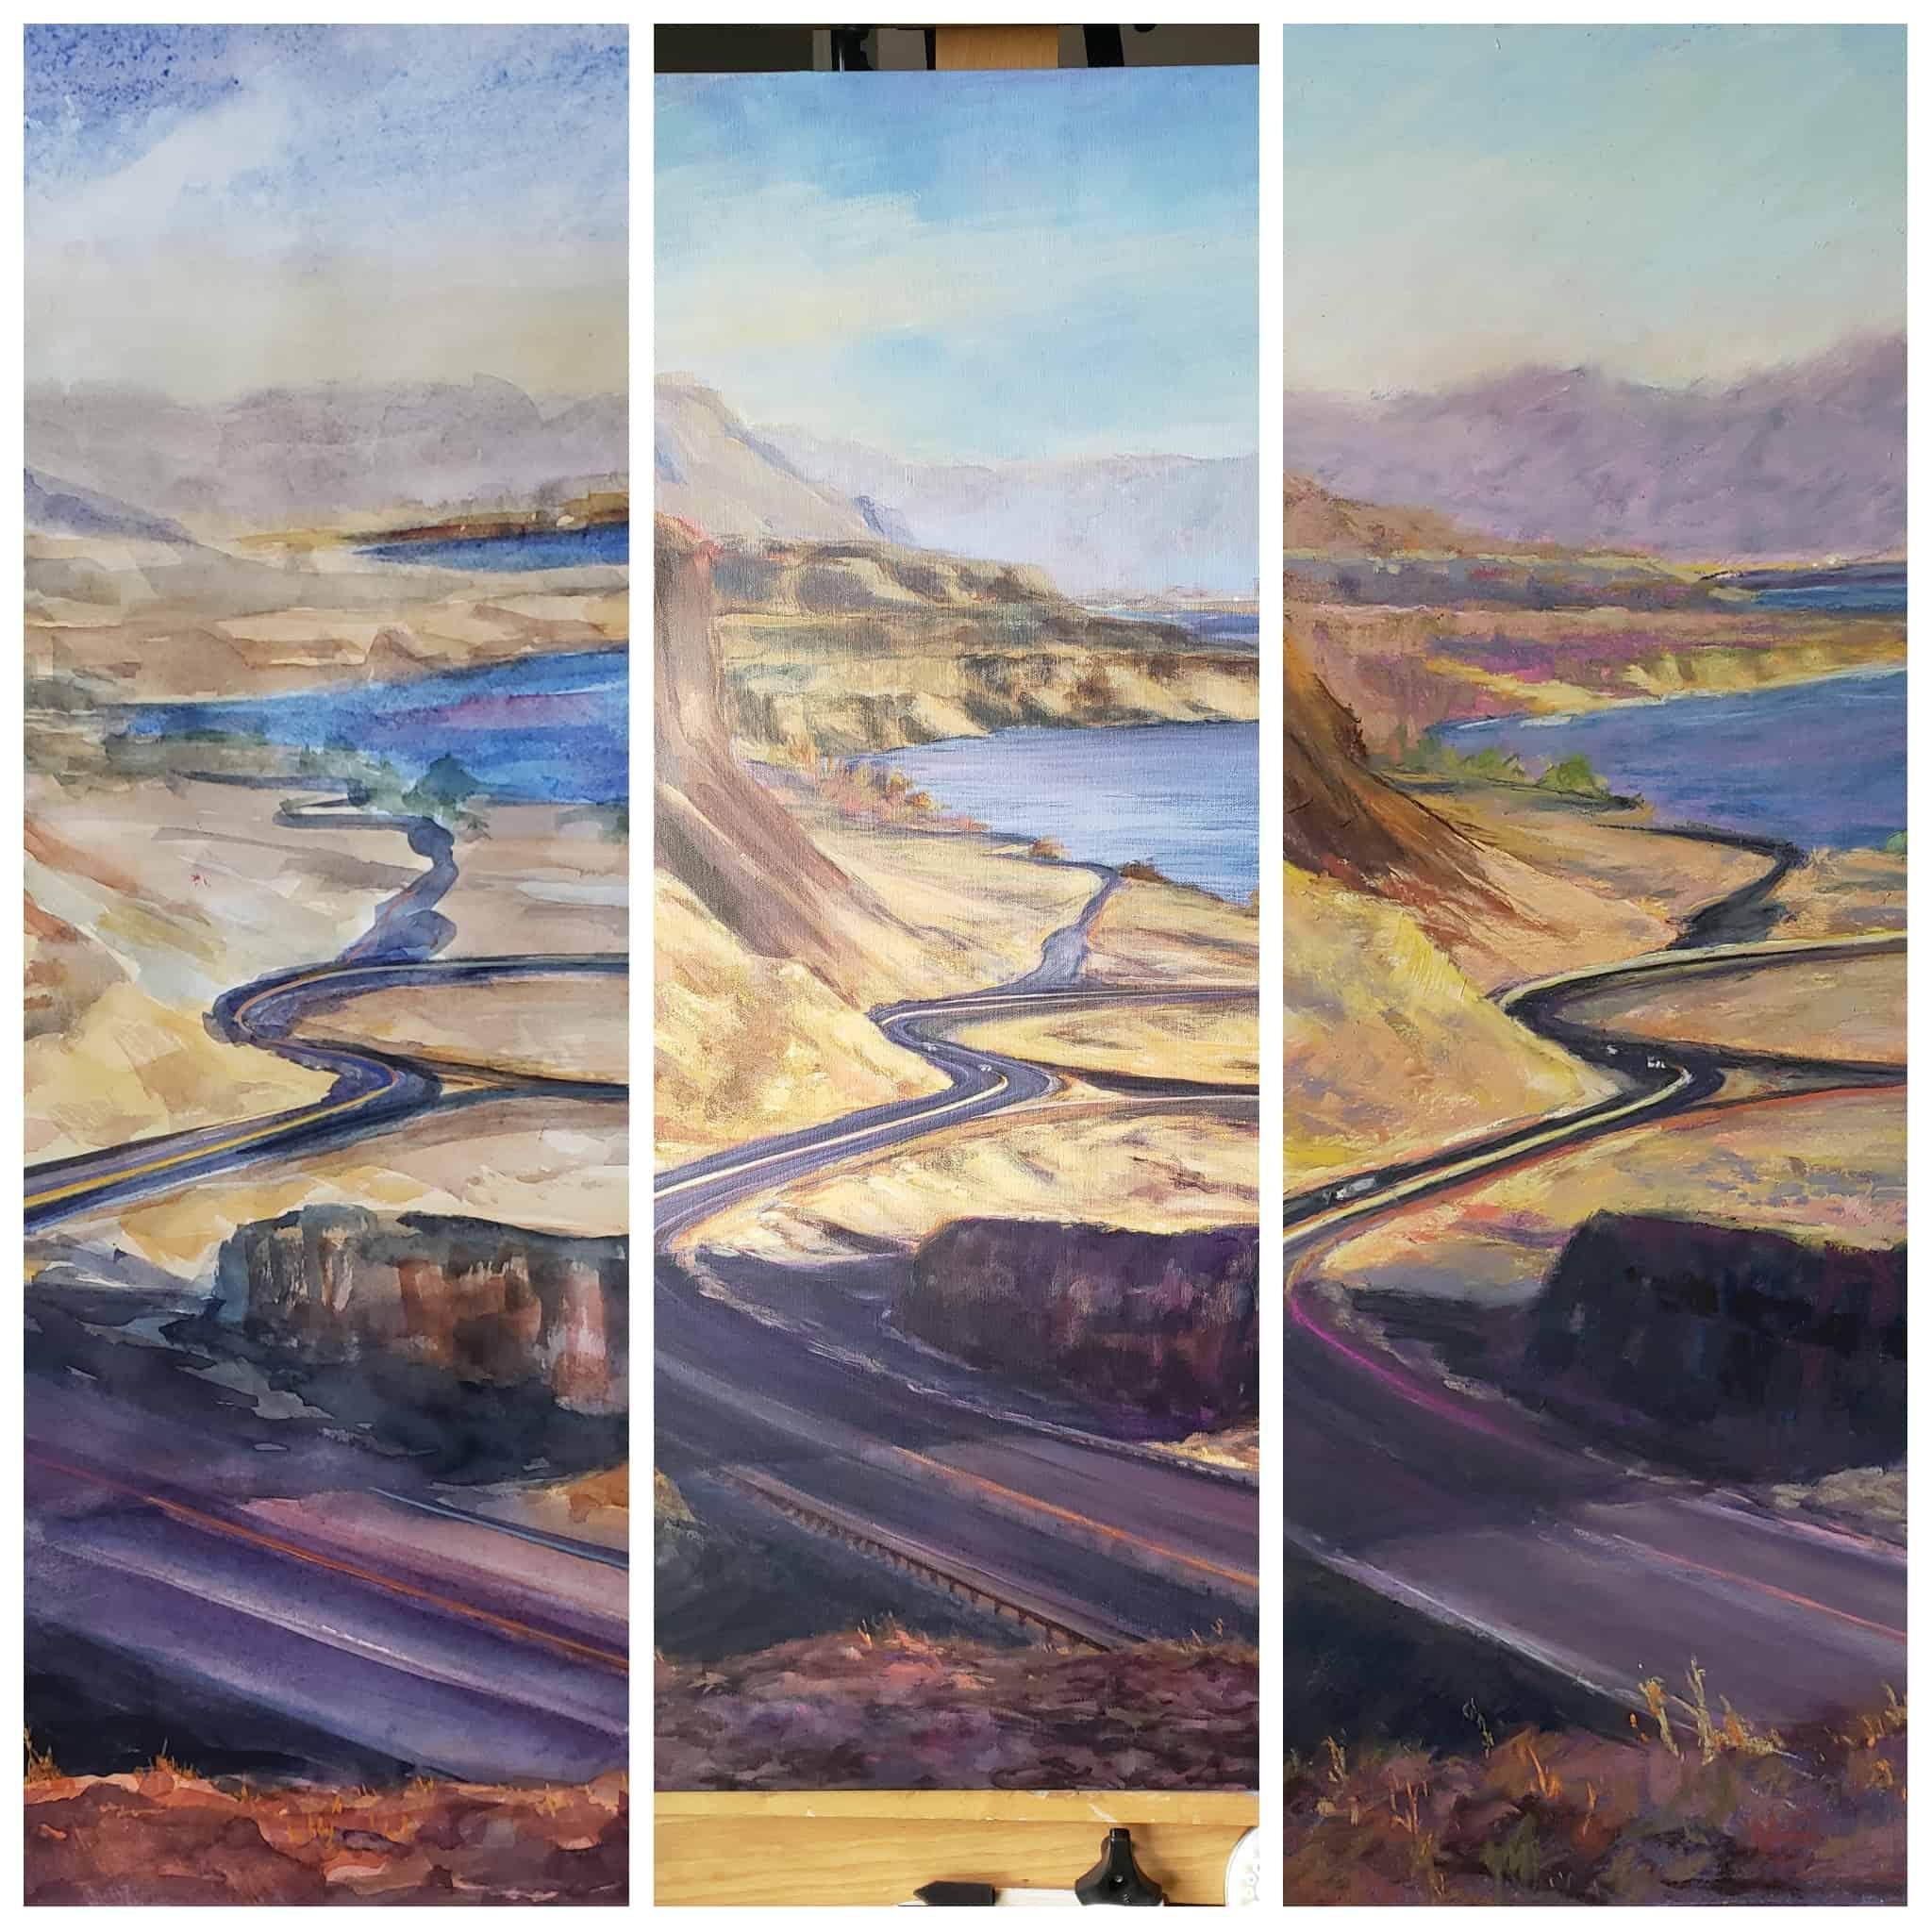 Vantage WA One Subject Painted Three Different Mediums